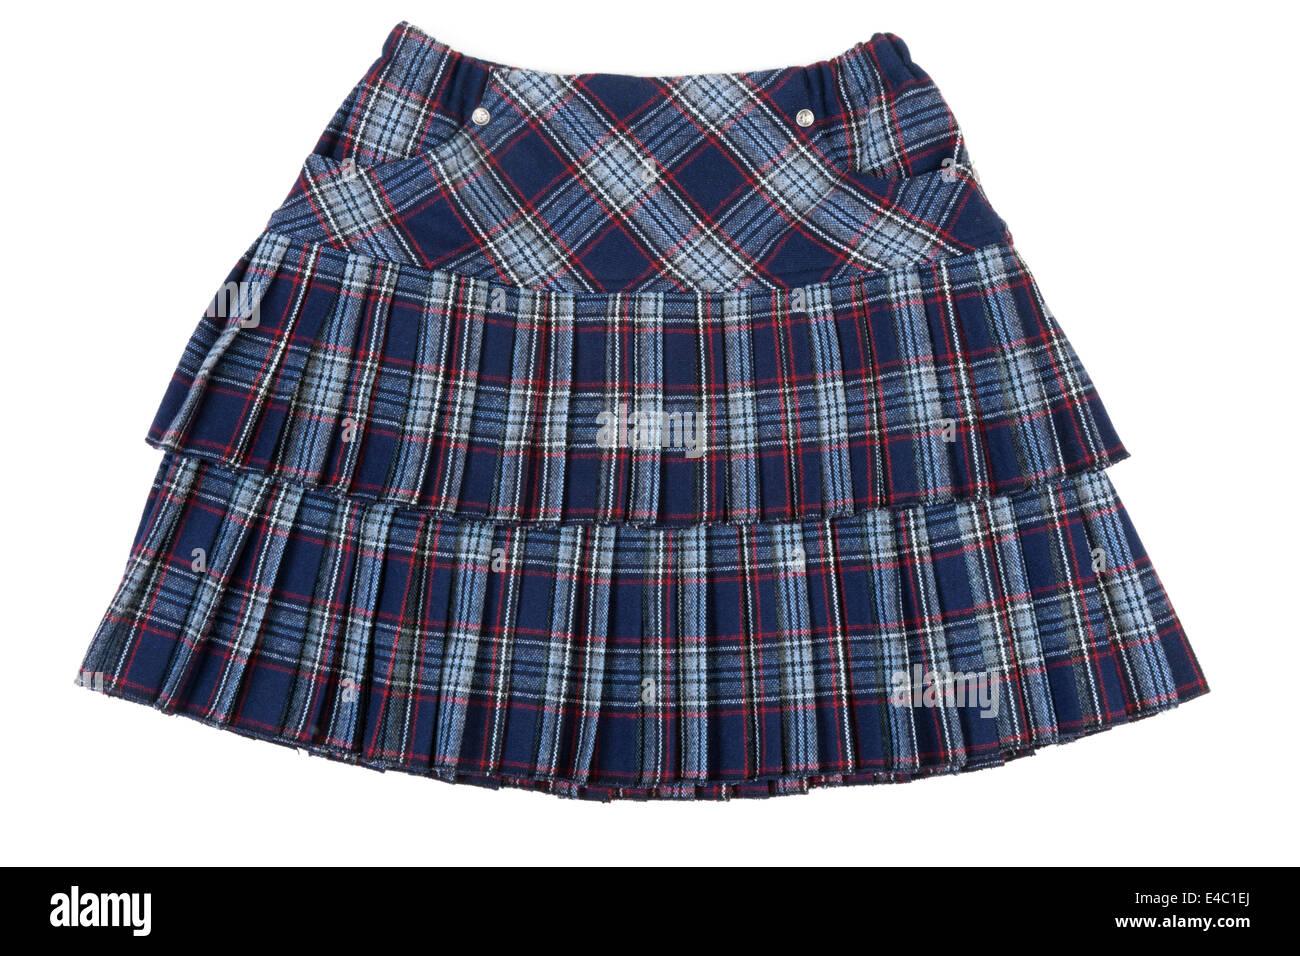 Plaid feminine skirt - Stock Image